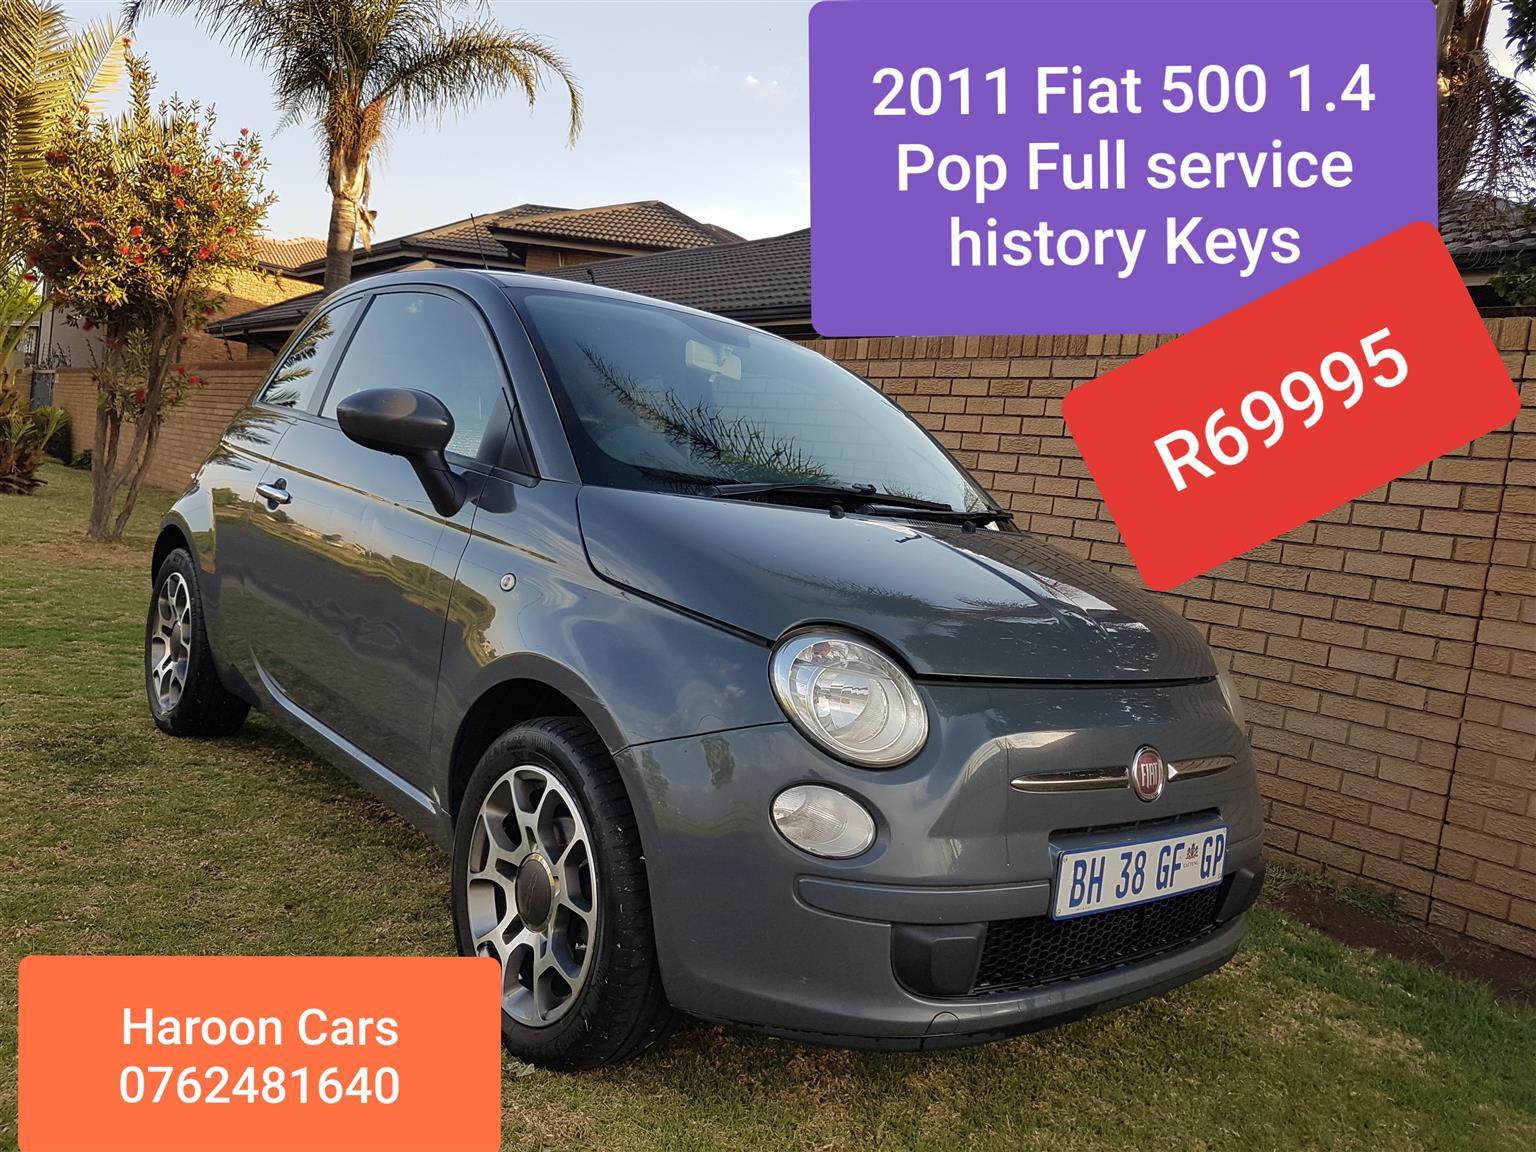 2011 Fiat 500 1.4 Pop